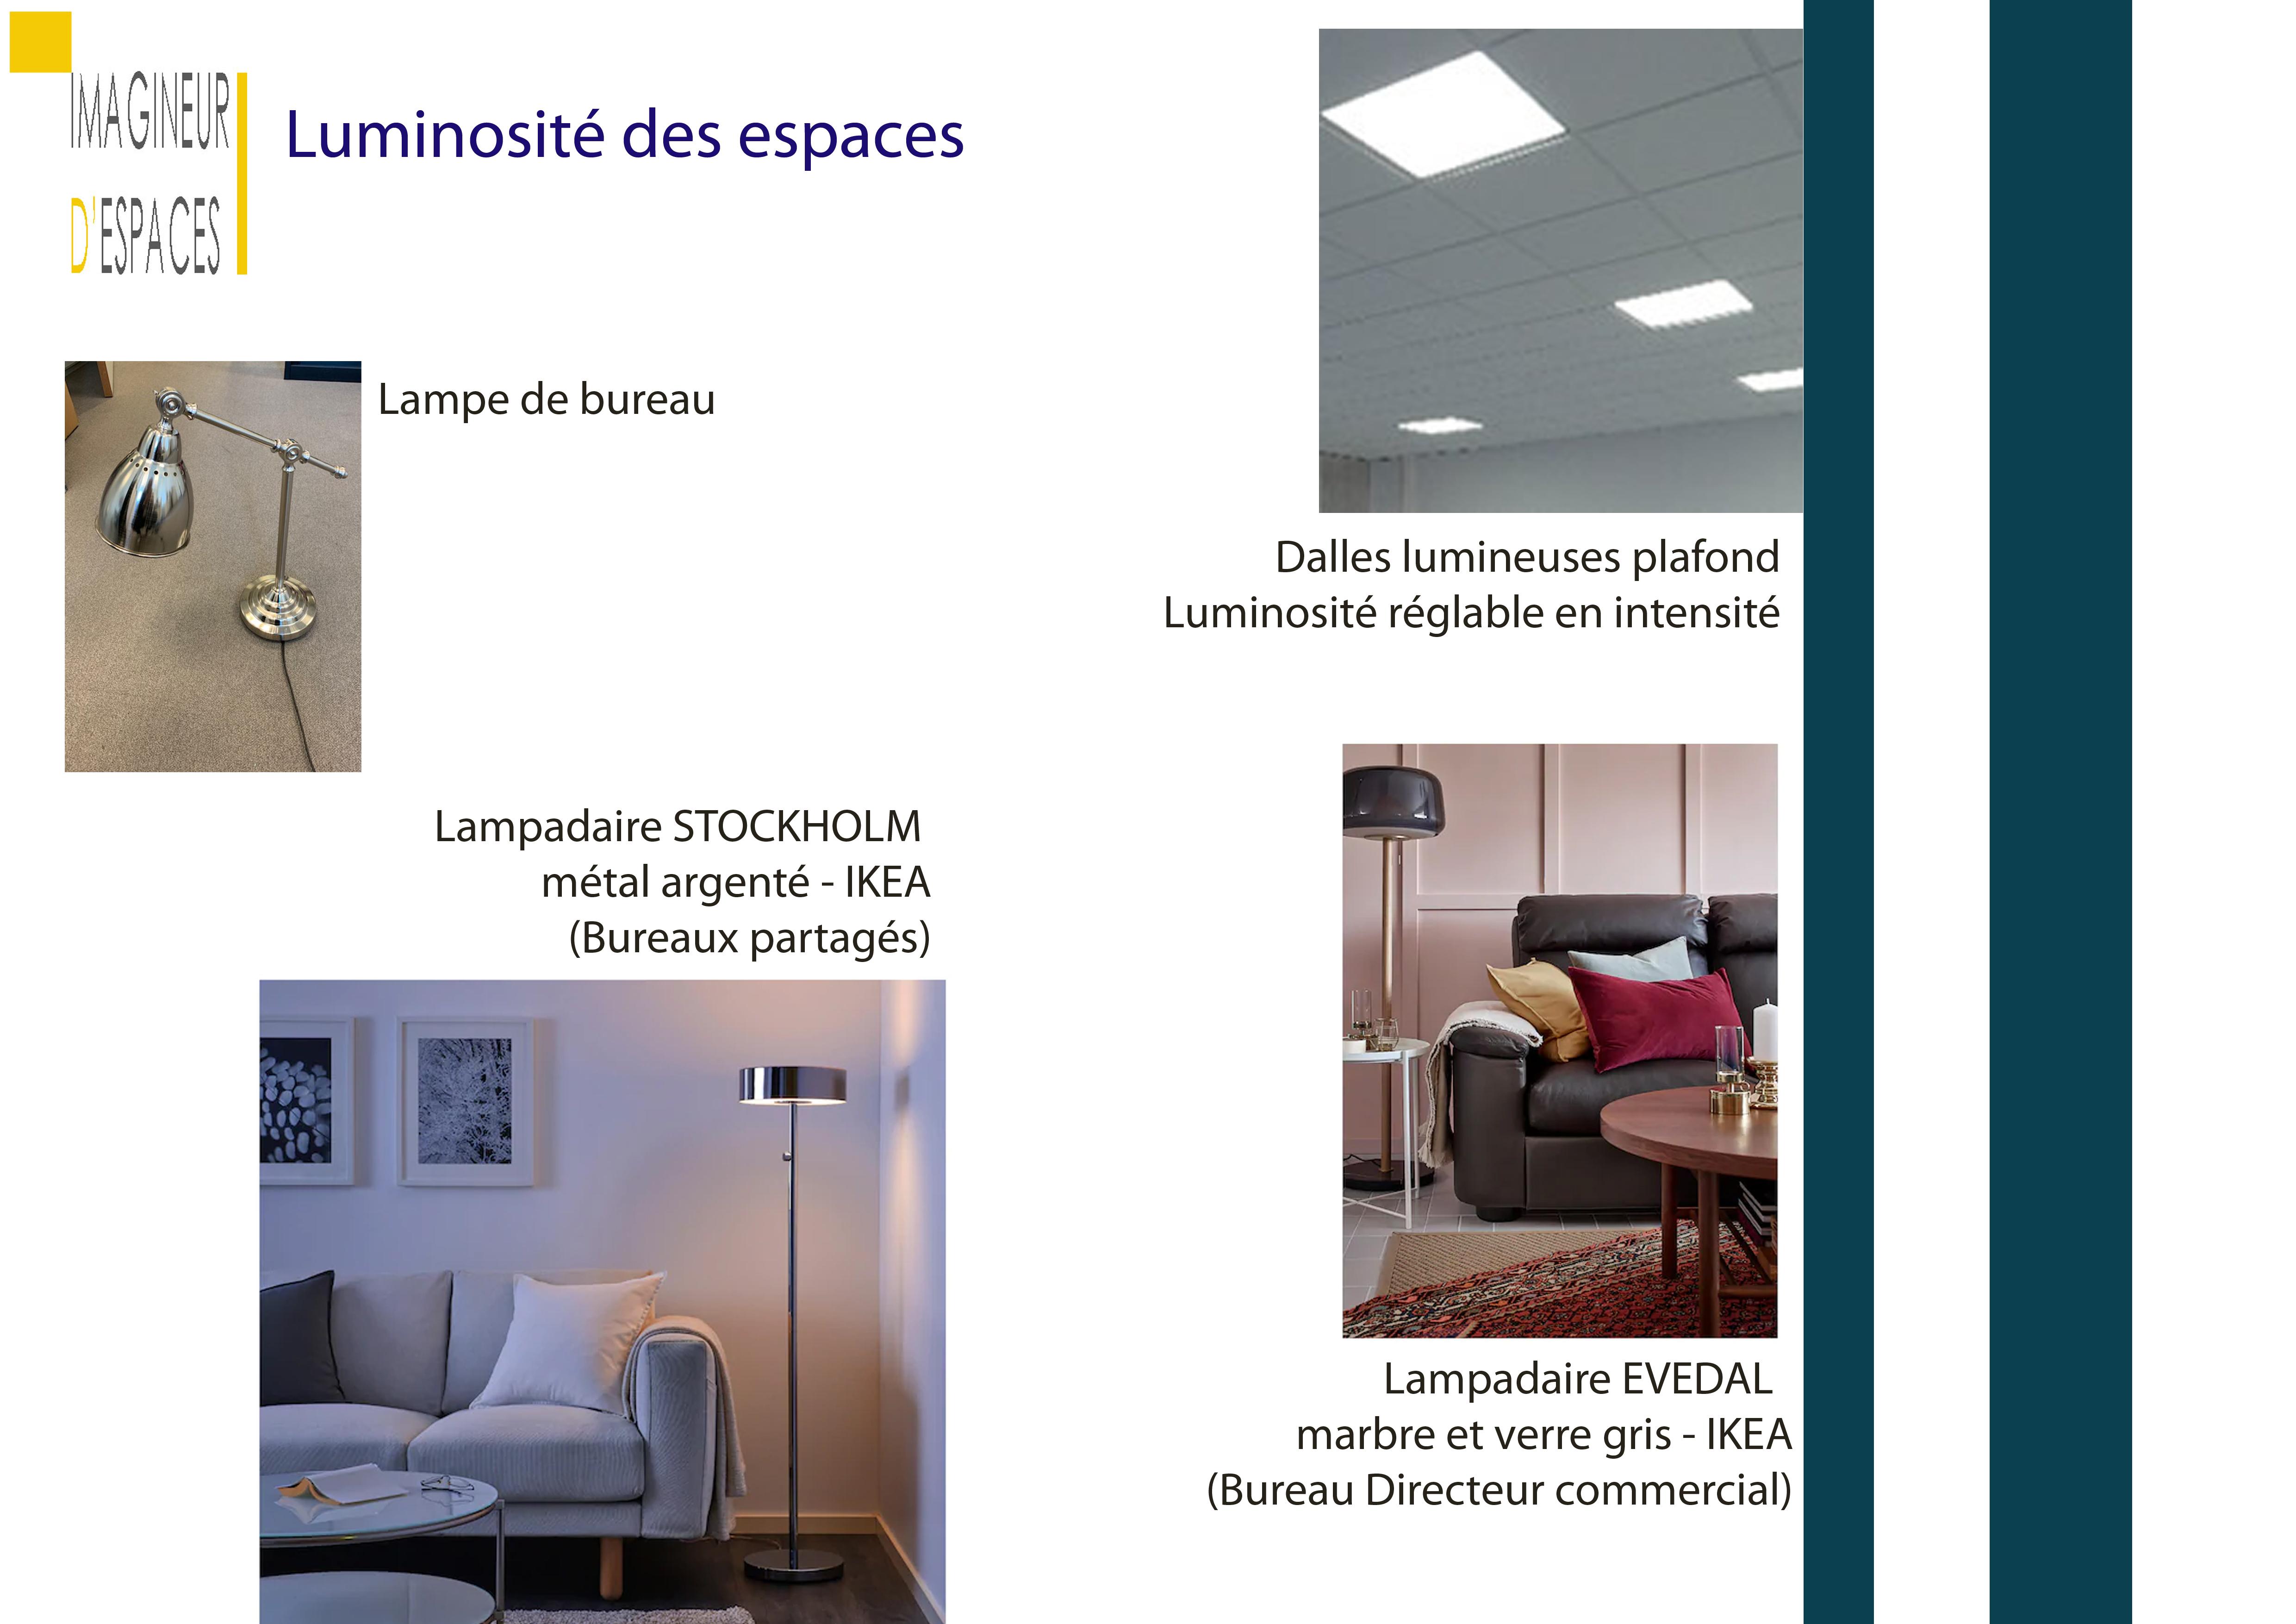 Sennheiser-planche_luminosité_modif